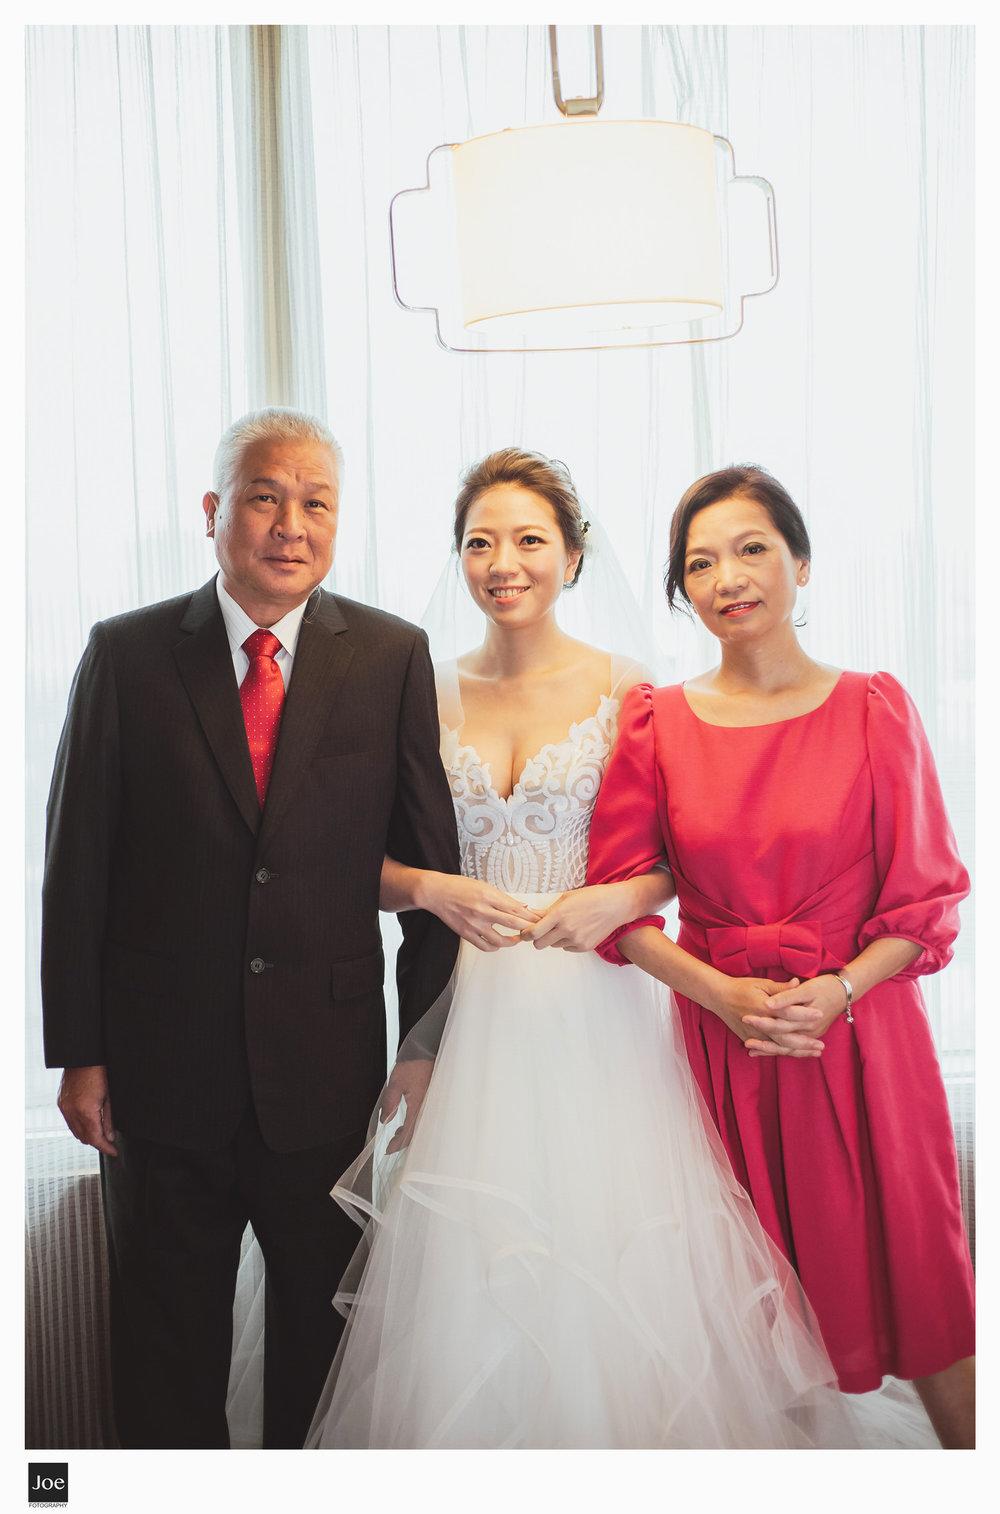 wedding-photography-shangri-la-far-eastern-plaza-hotel-ariel-sam-joe-fotography-020.jpg